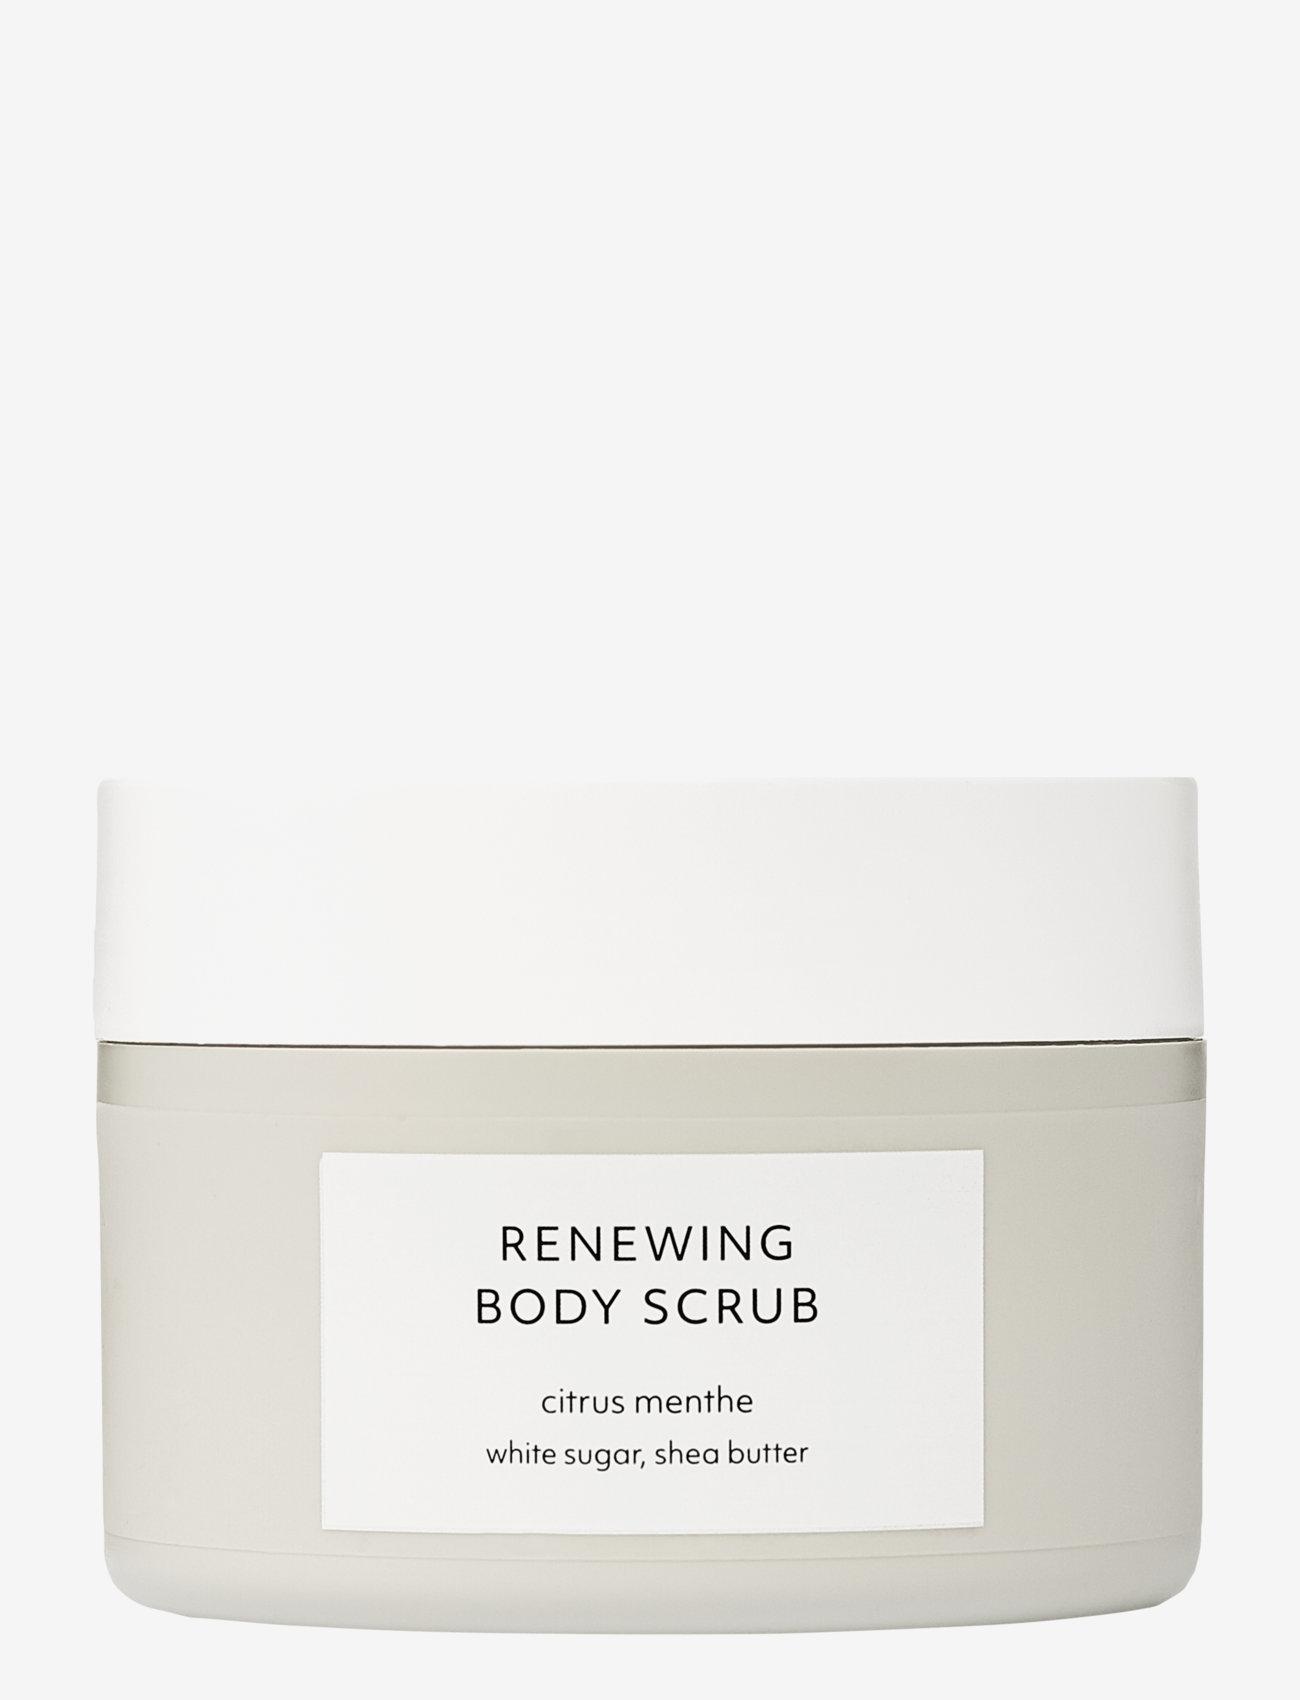 Estelle & Thild - Citrus Menthe Renewing Body Scrub - kuorinta - no colour - 0